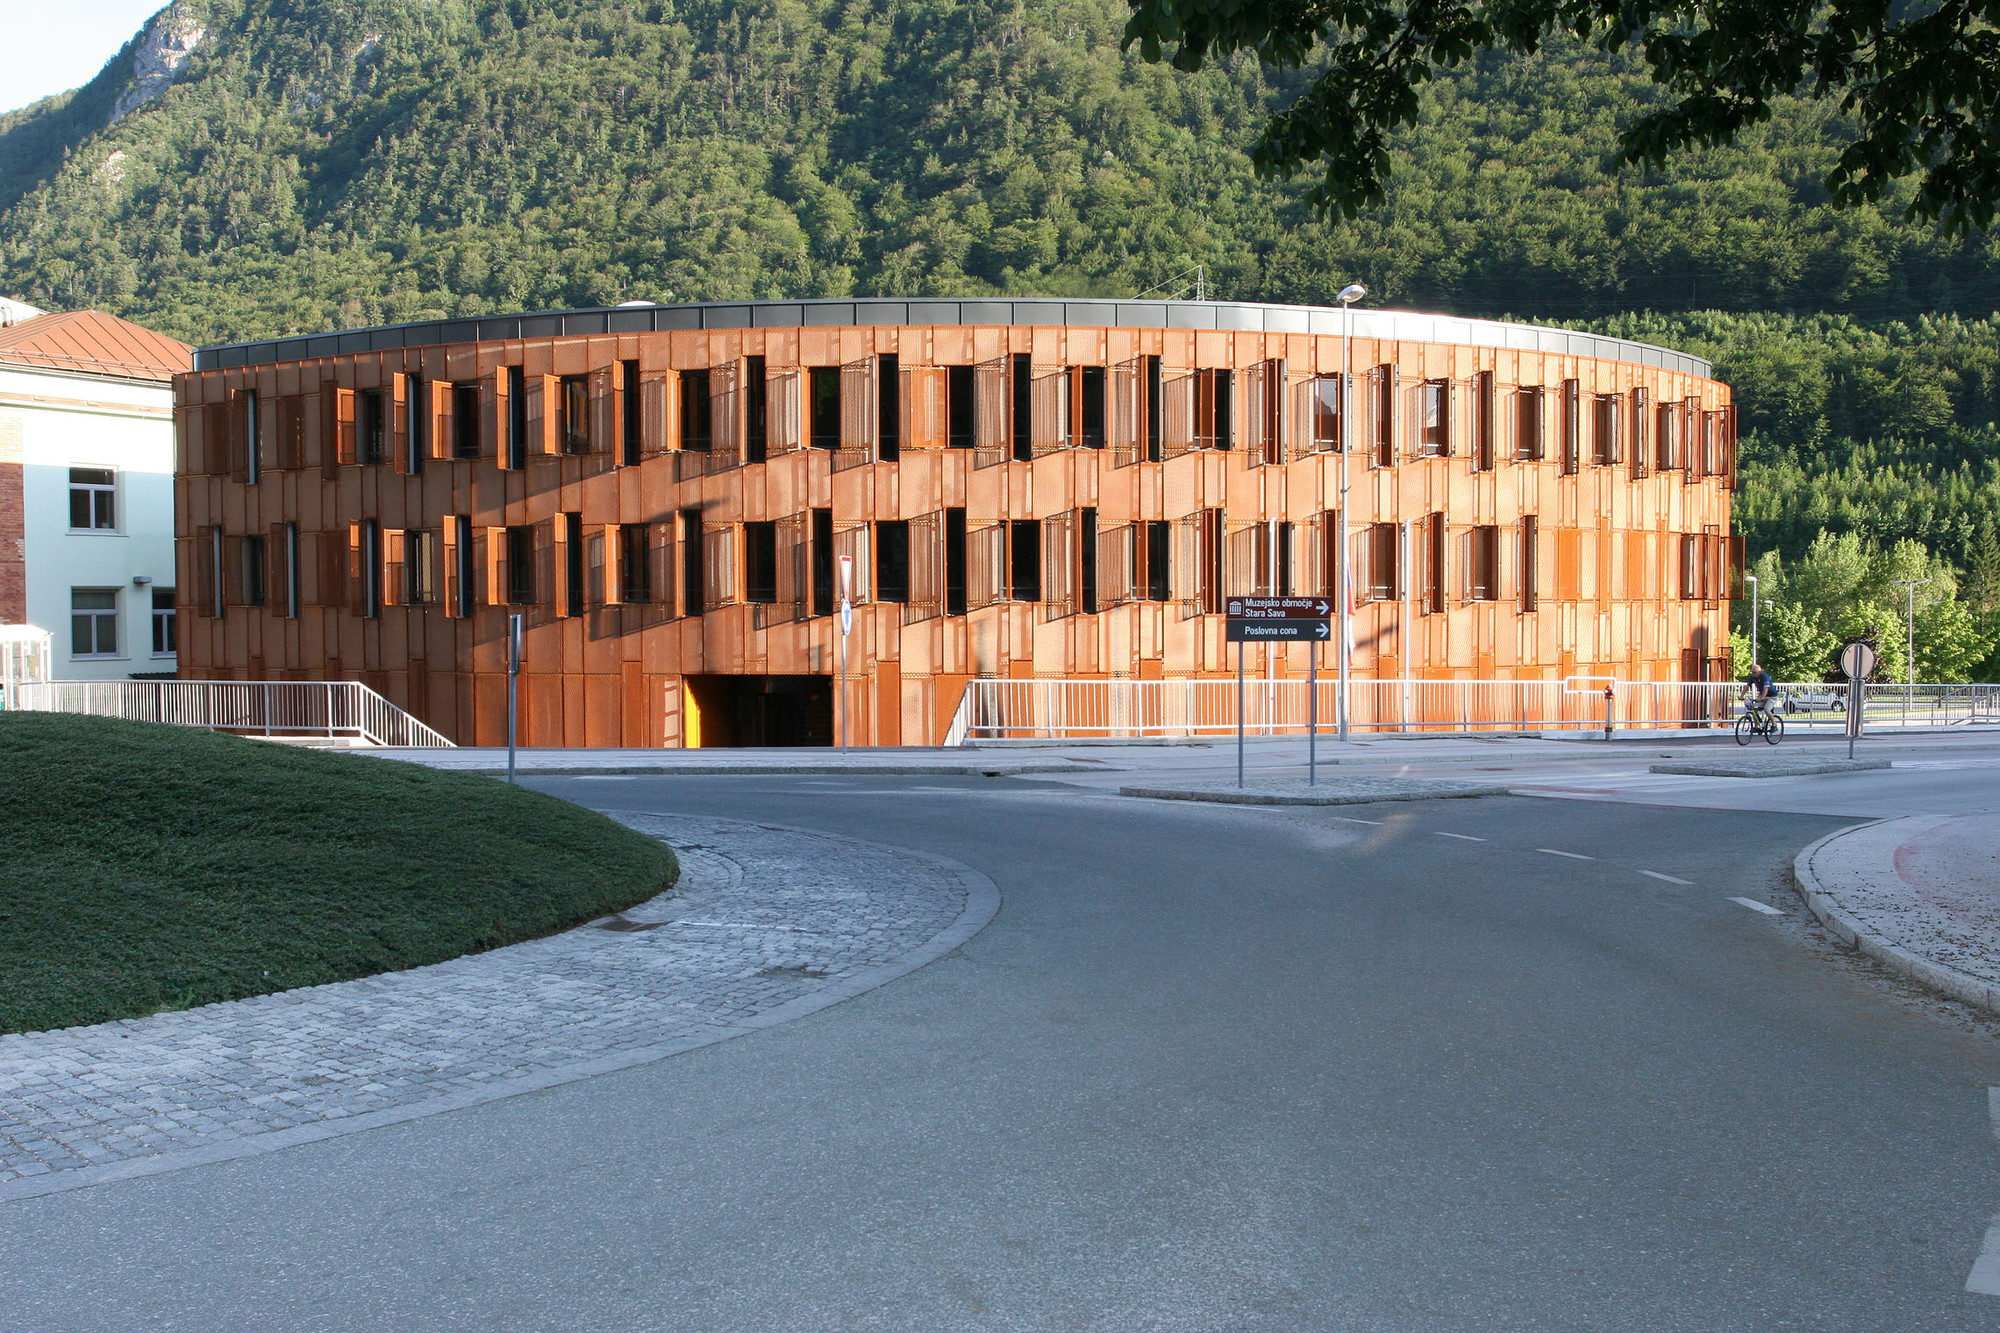 Administrative Center Jesenice / Studio Kalamar, Courtesy of Studio Kalamar